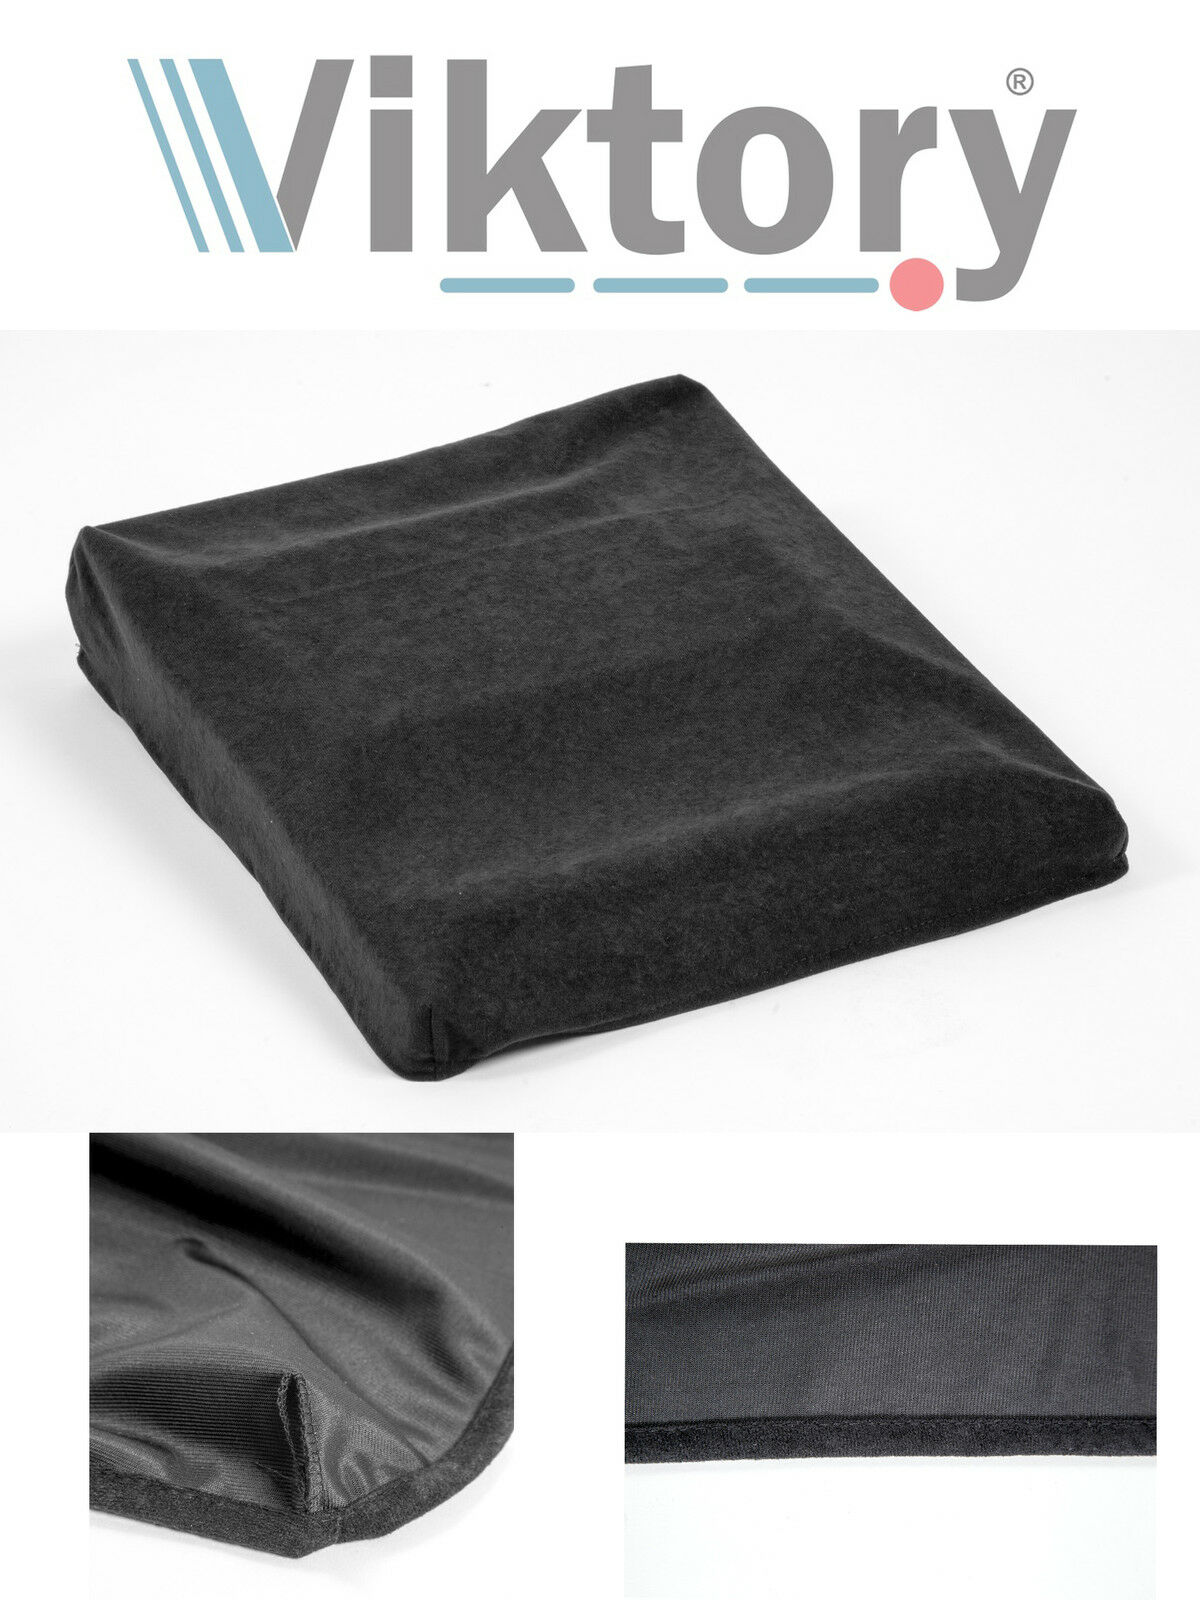 Mischpult YAMAHA PM 5 D Abdeckung Staubschutz Dust Cover Viktory